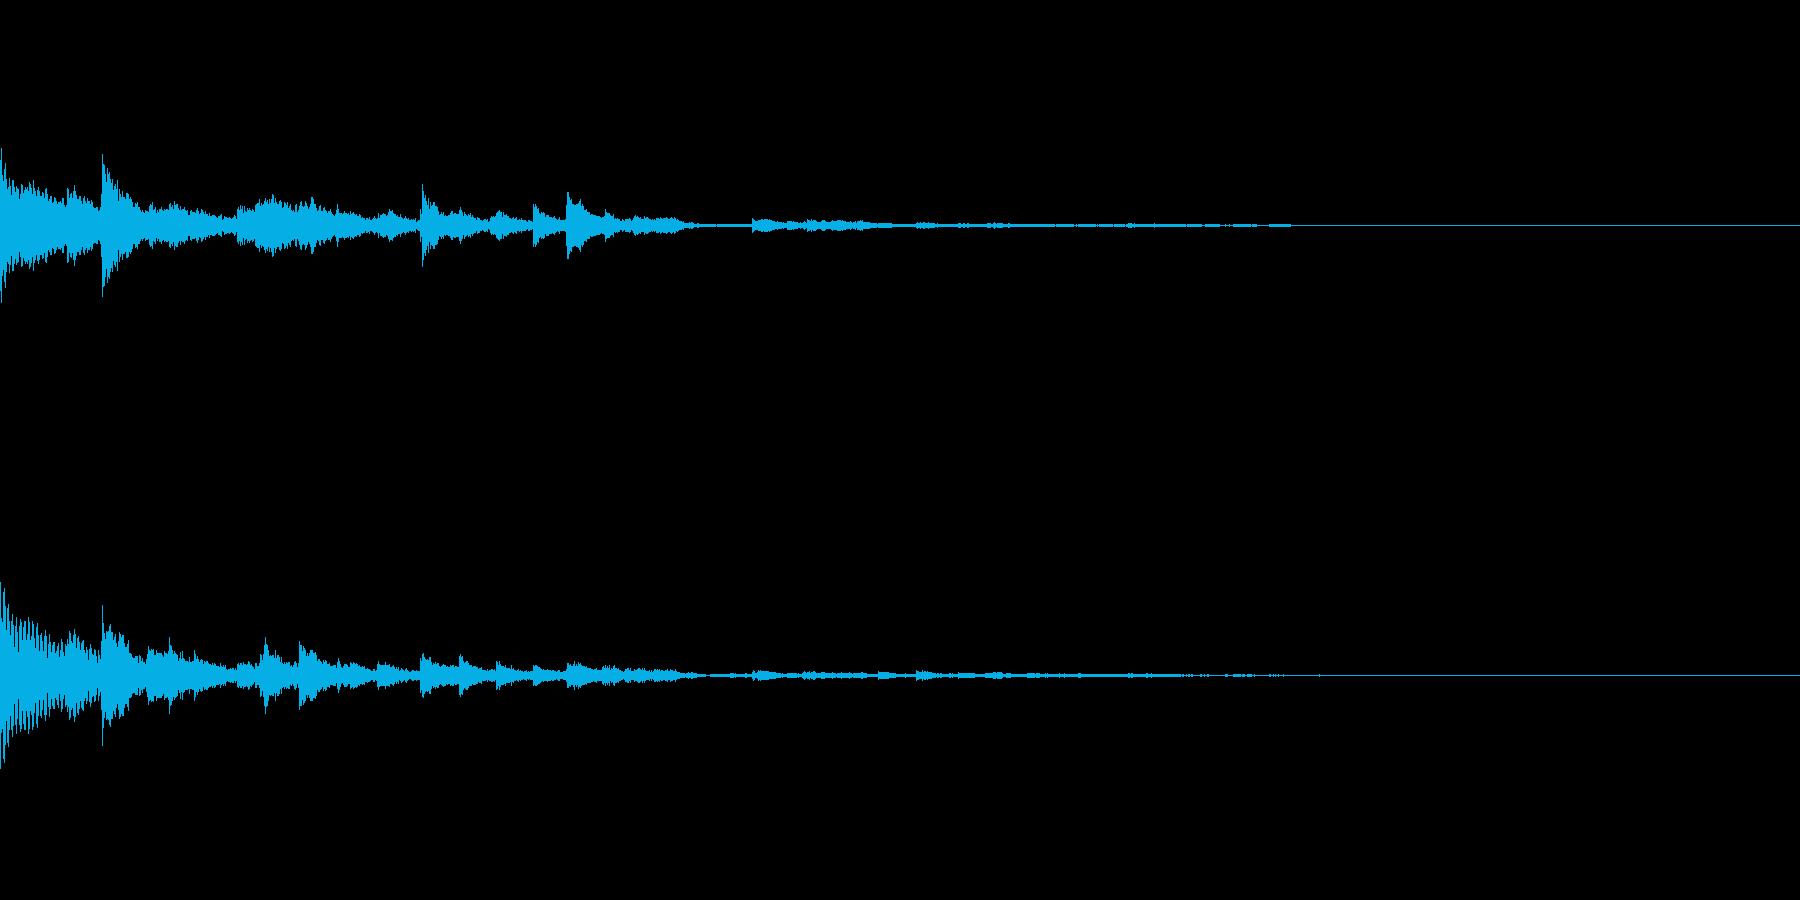 【SE 効果音】鈴の音の再生済みの波形